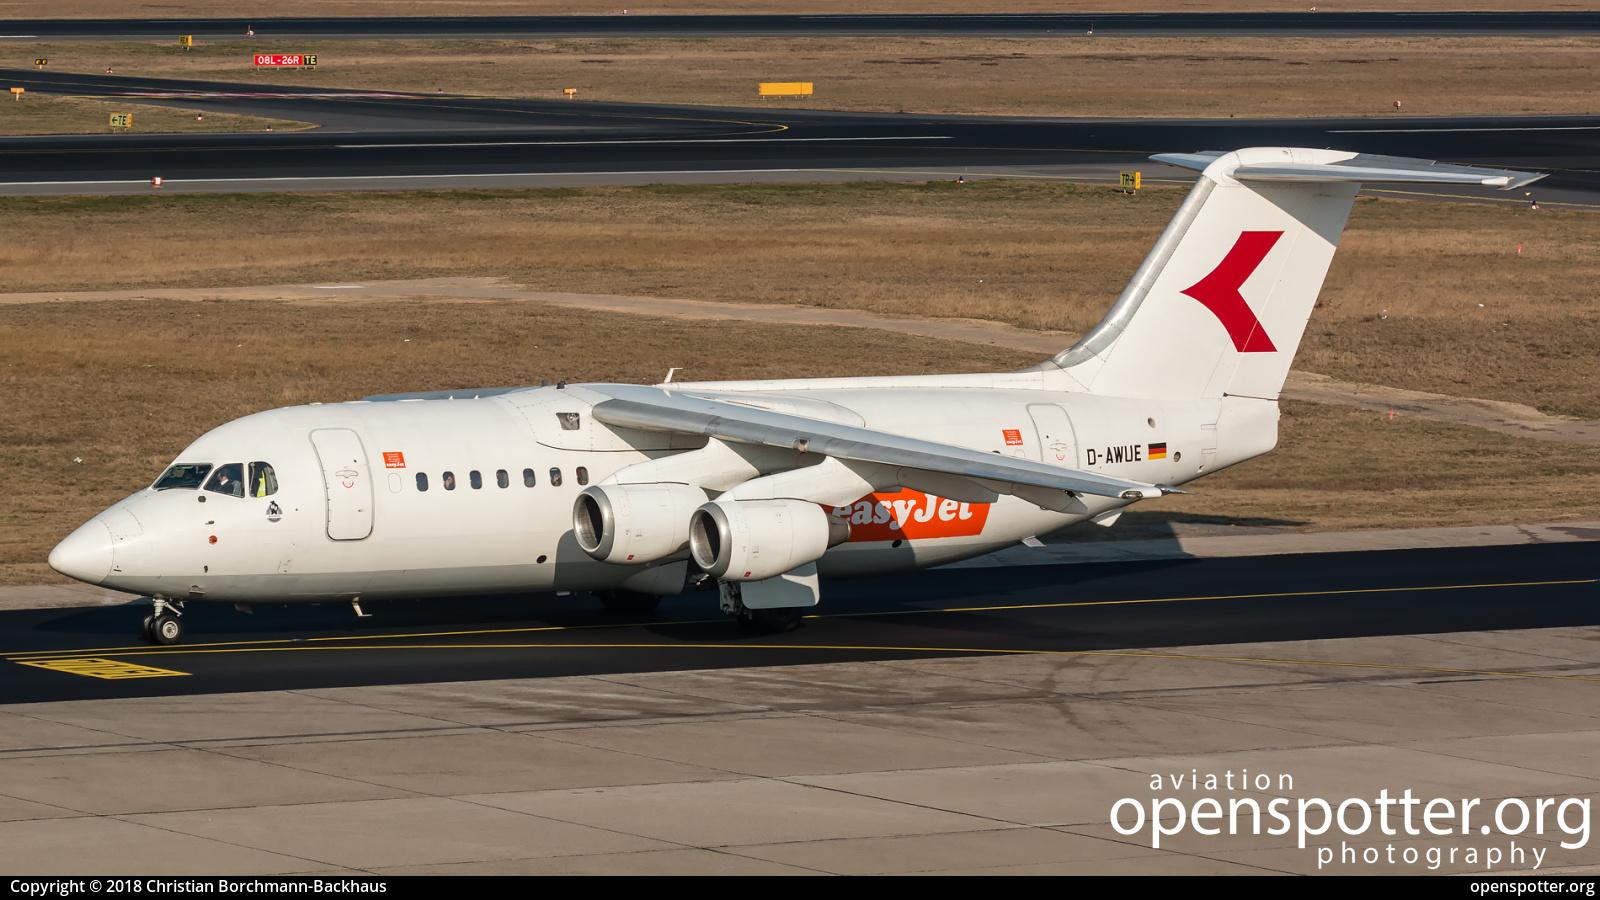 D-AWUE - WDL Aviation British Aerospace 146-200A at Berlin-Tegel Airport (TXL/EDDT) taken by Christian Borchmann-Backhaus | openspotter.org | ID: 51518